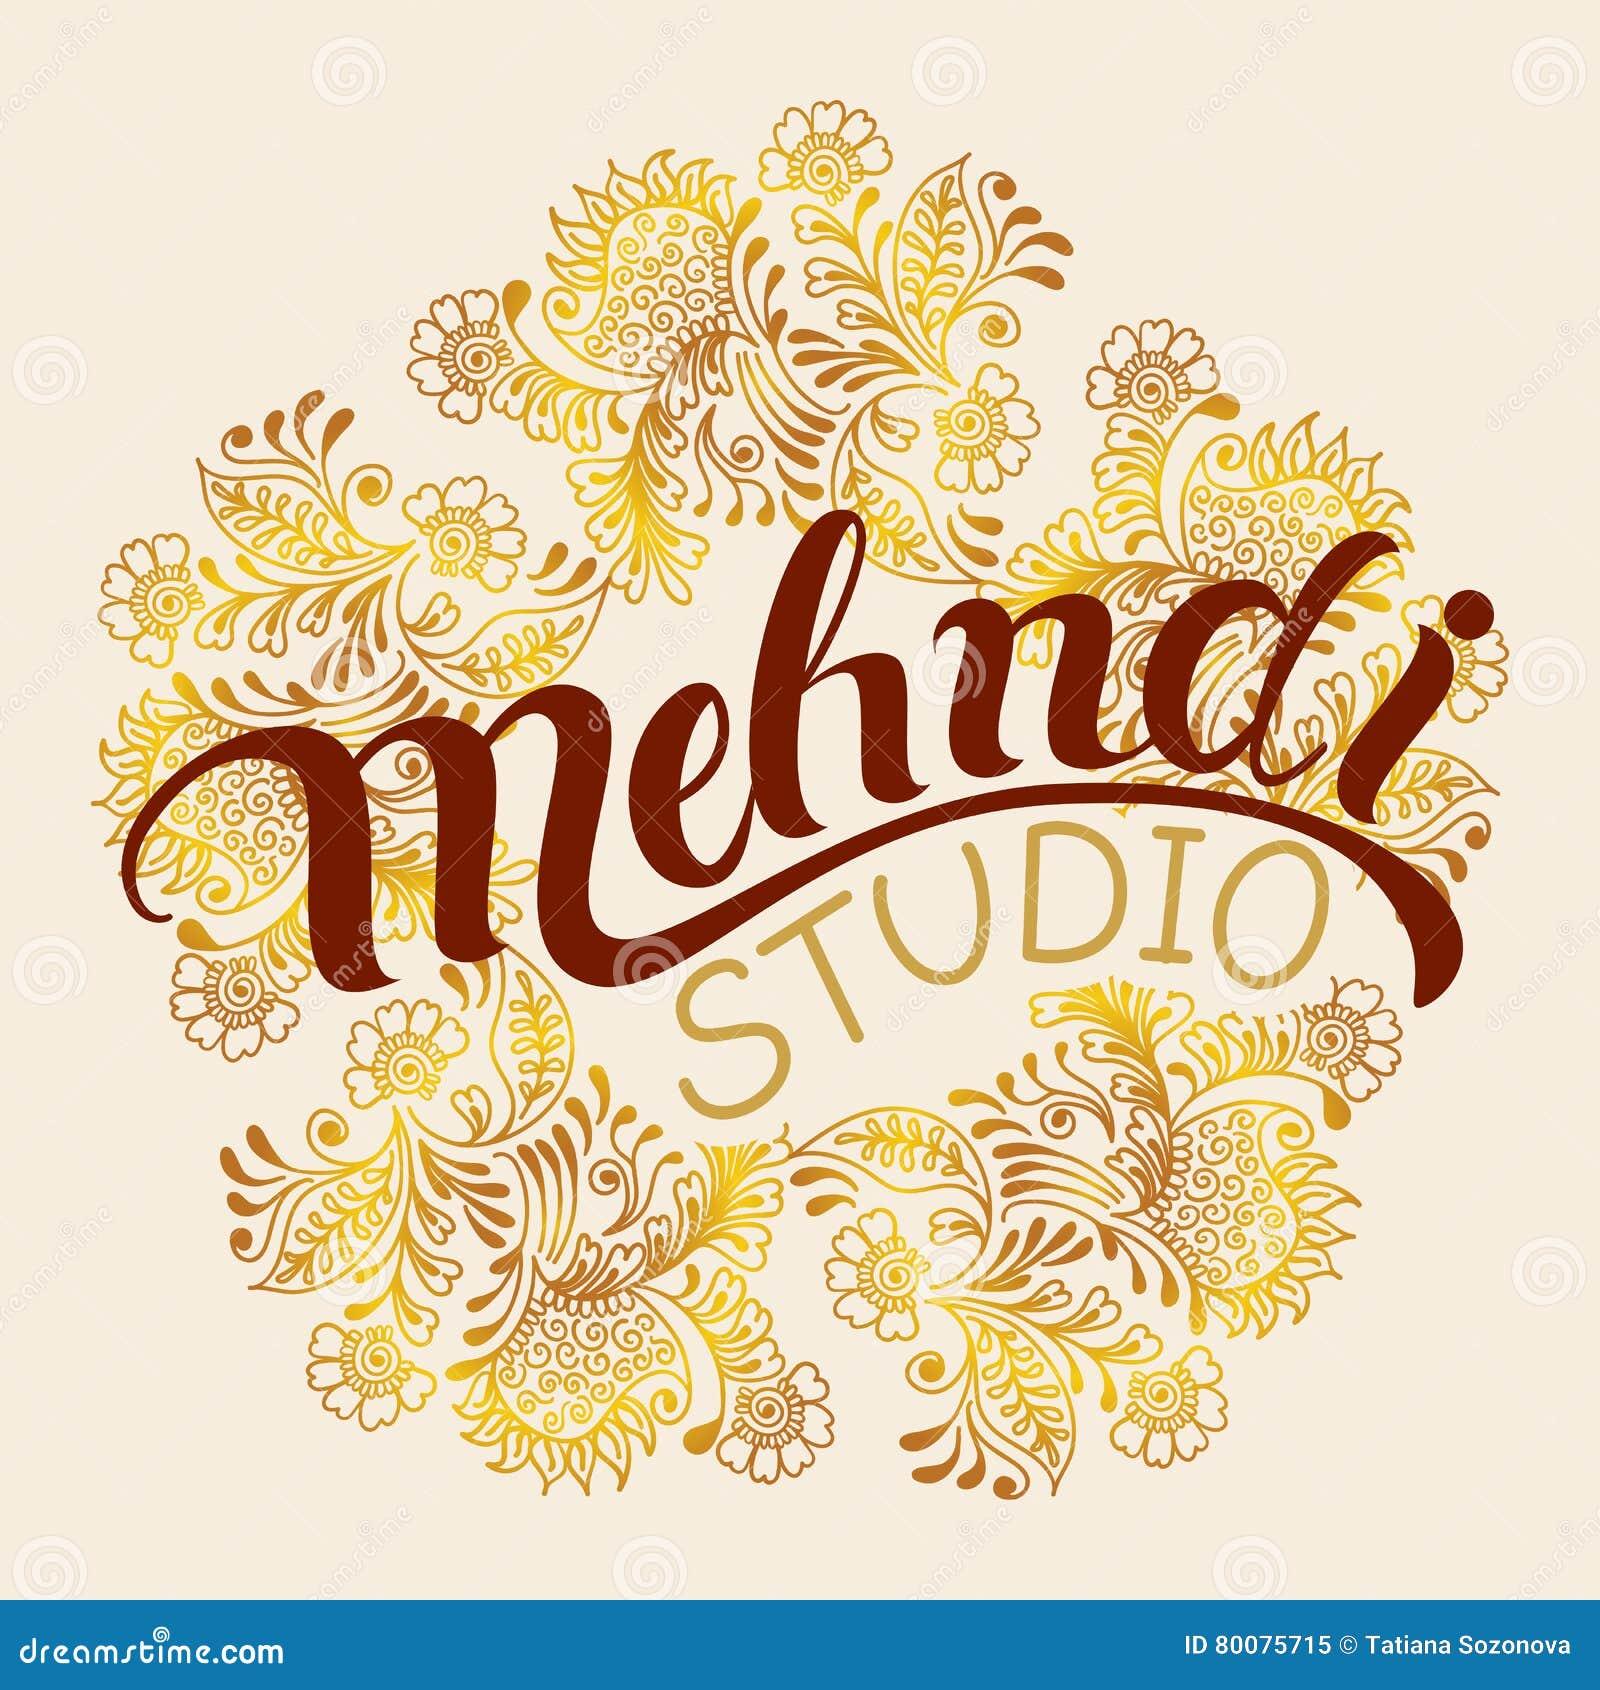 Mehndi Studio Logo Stock Vector Illustration Of Meditation 80075715